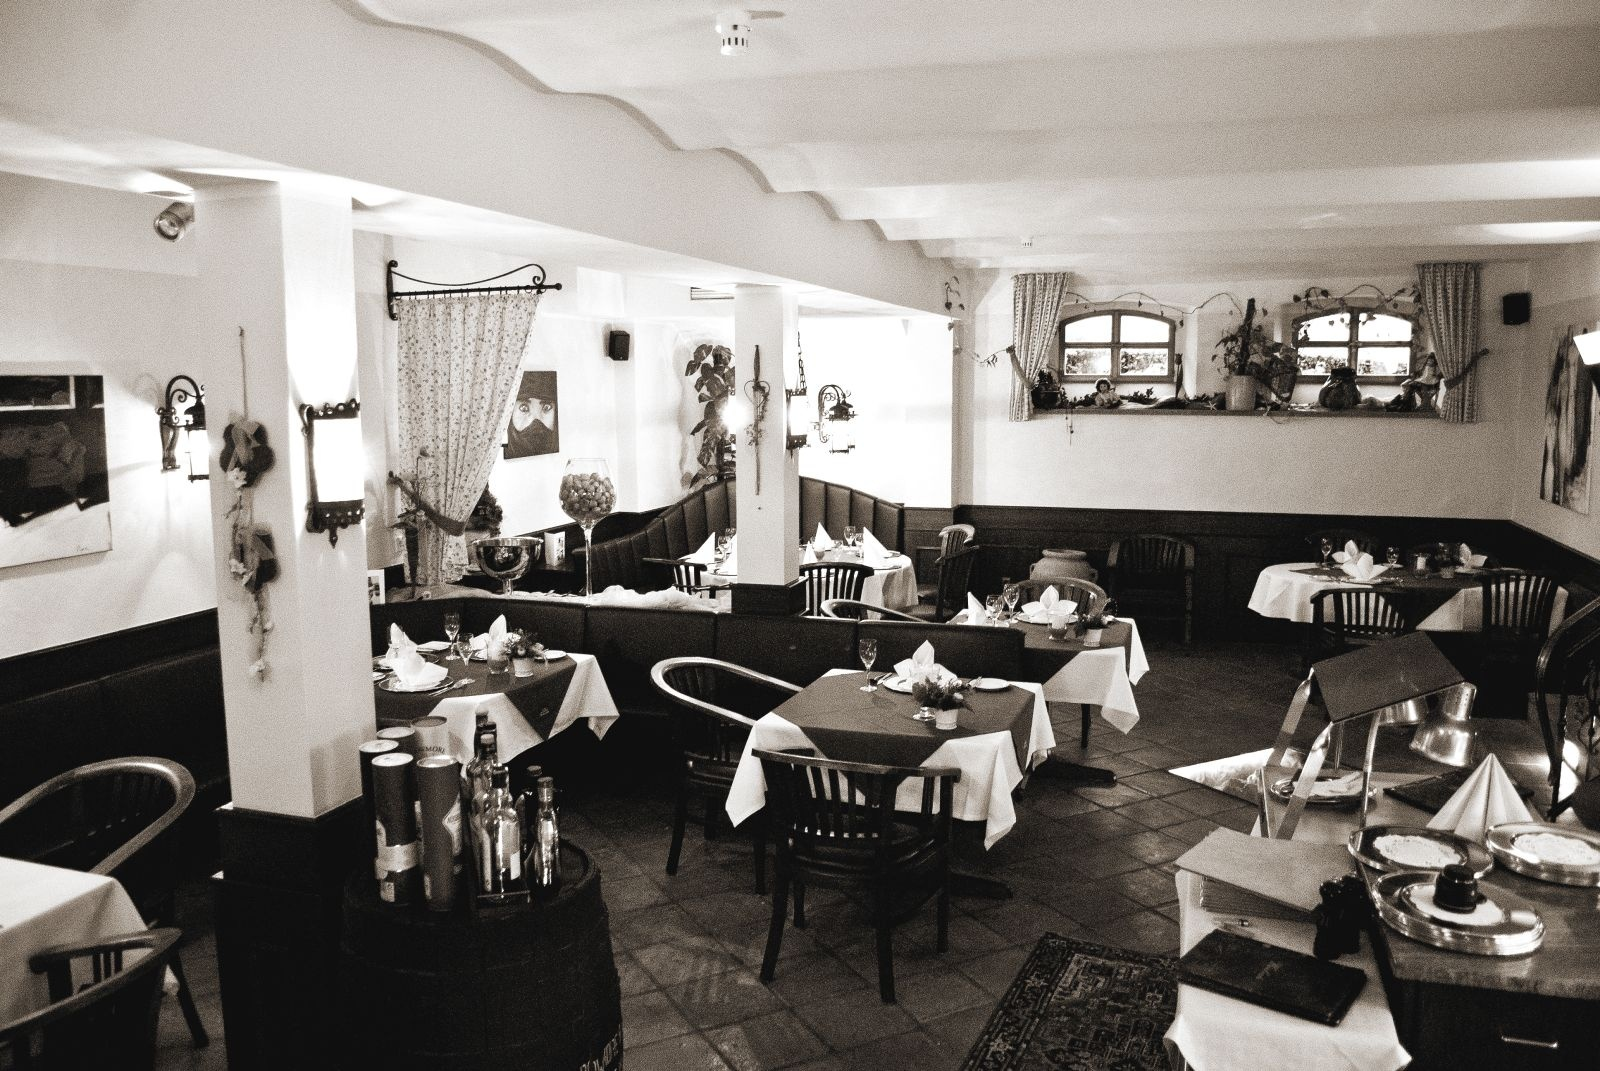 Restuarant in Zeitlers Hotel & Apartments